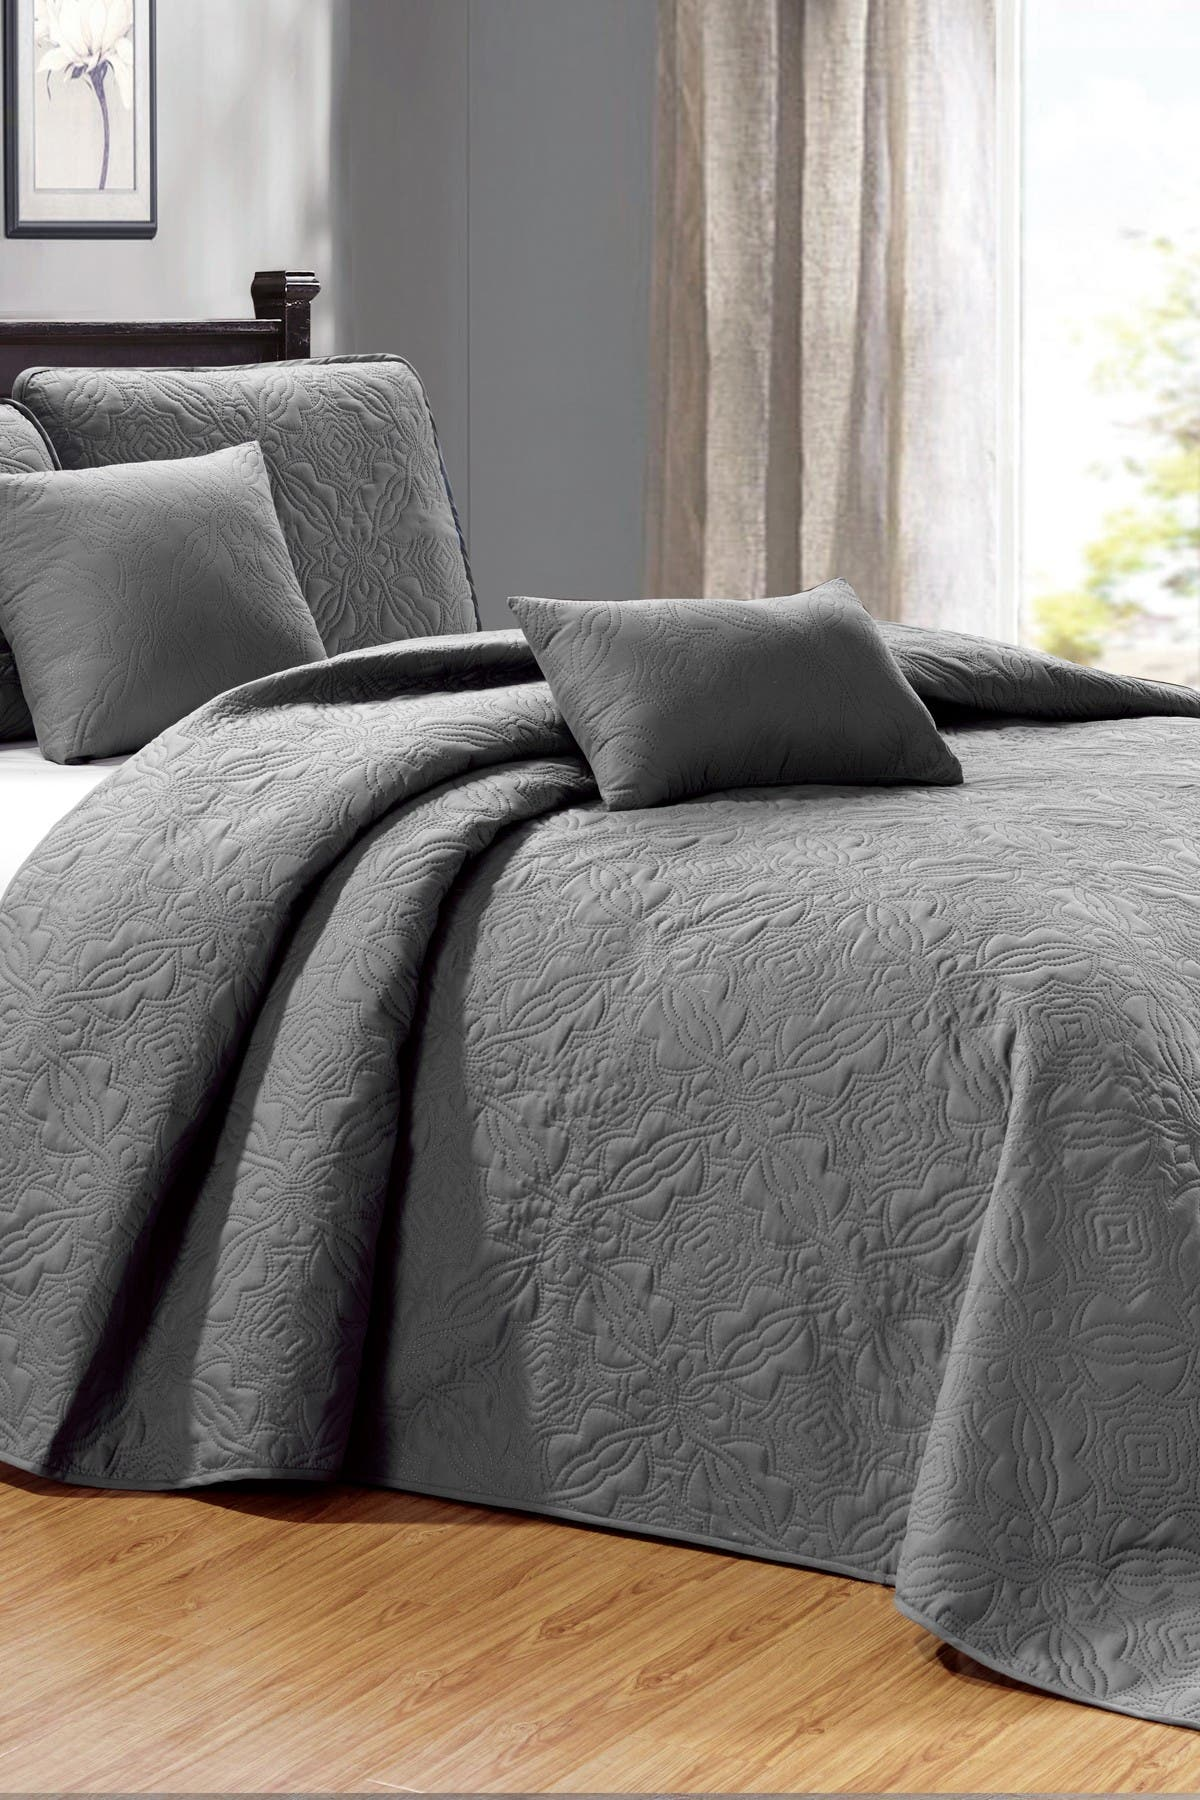 Image of Duck River Textile Carlotta 5-Piece Queen Bedspread Set - Grey